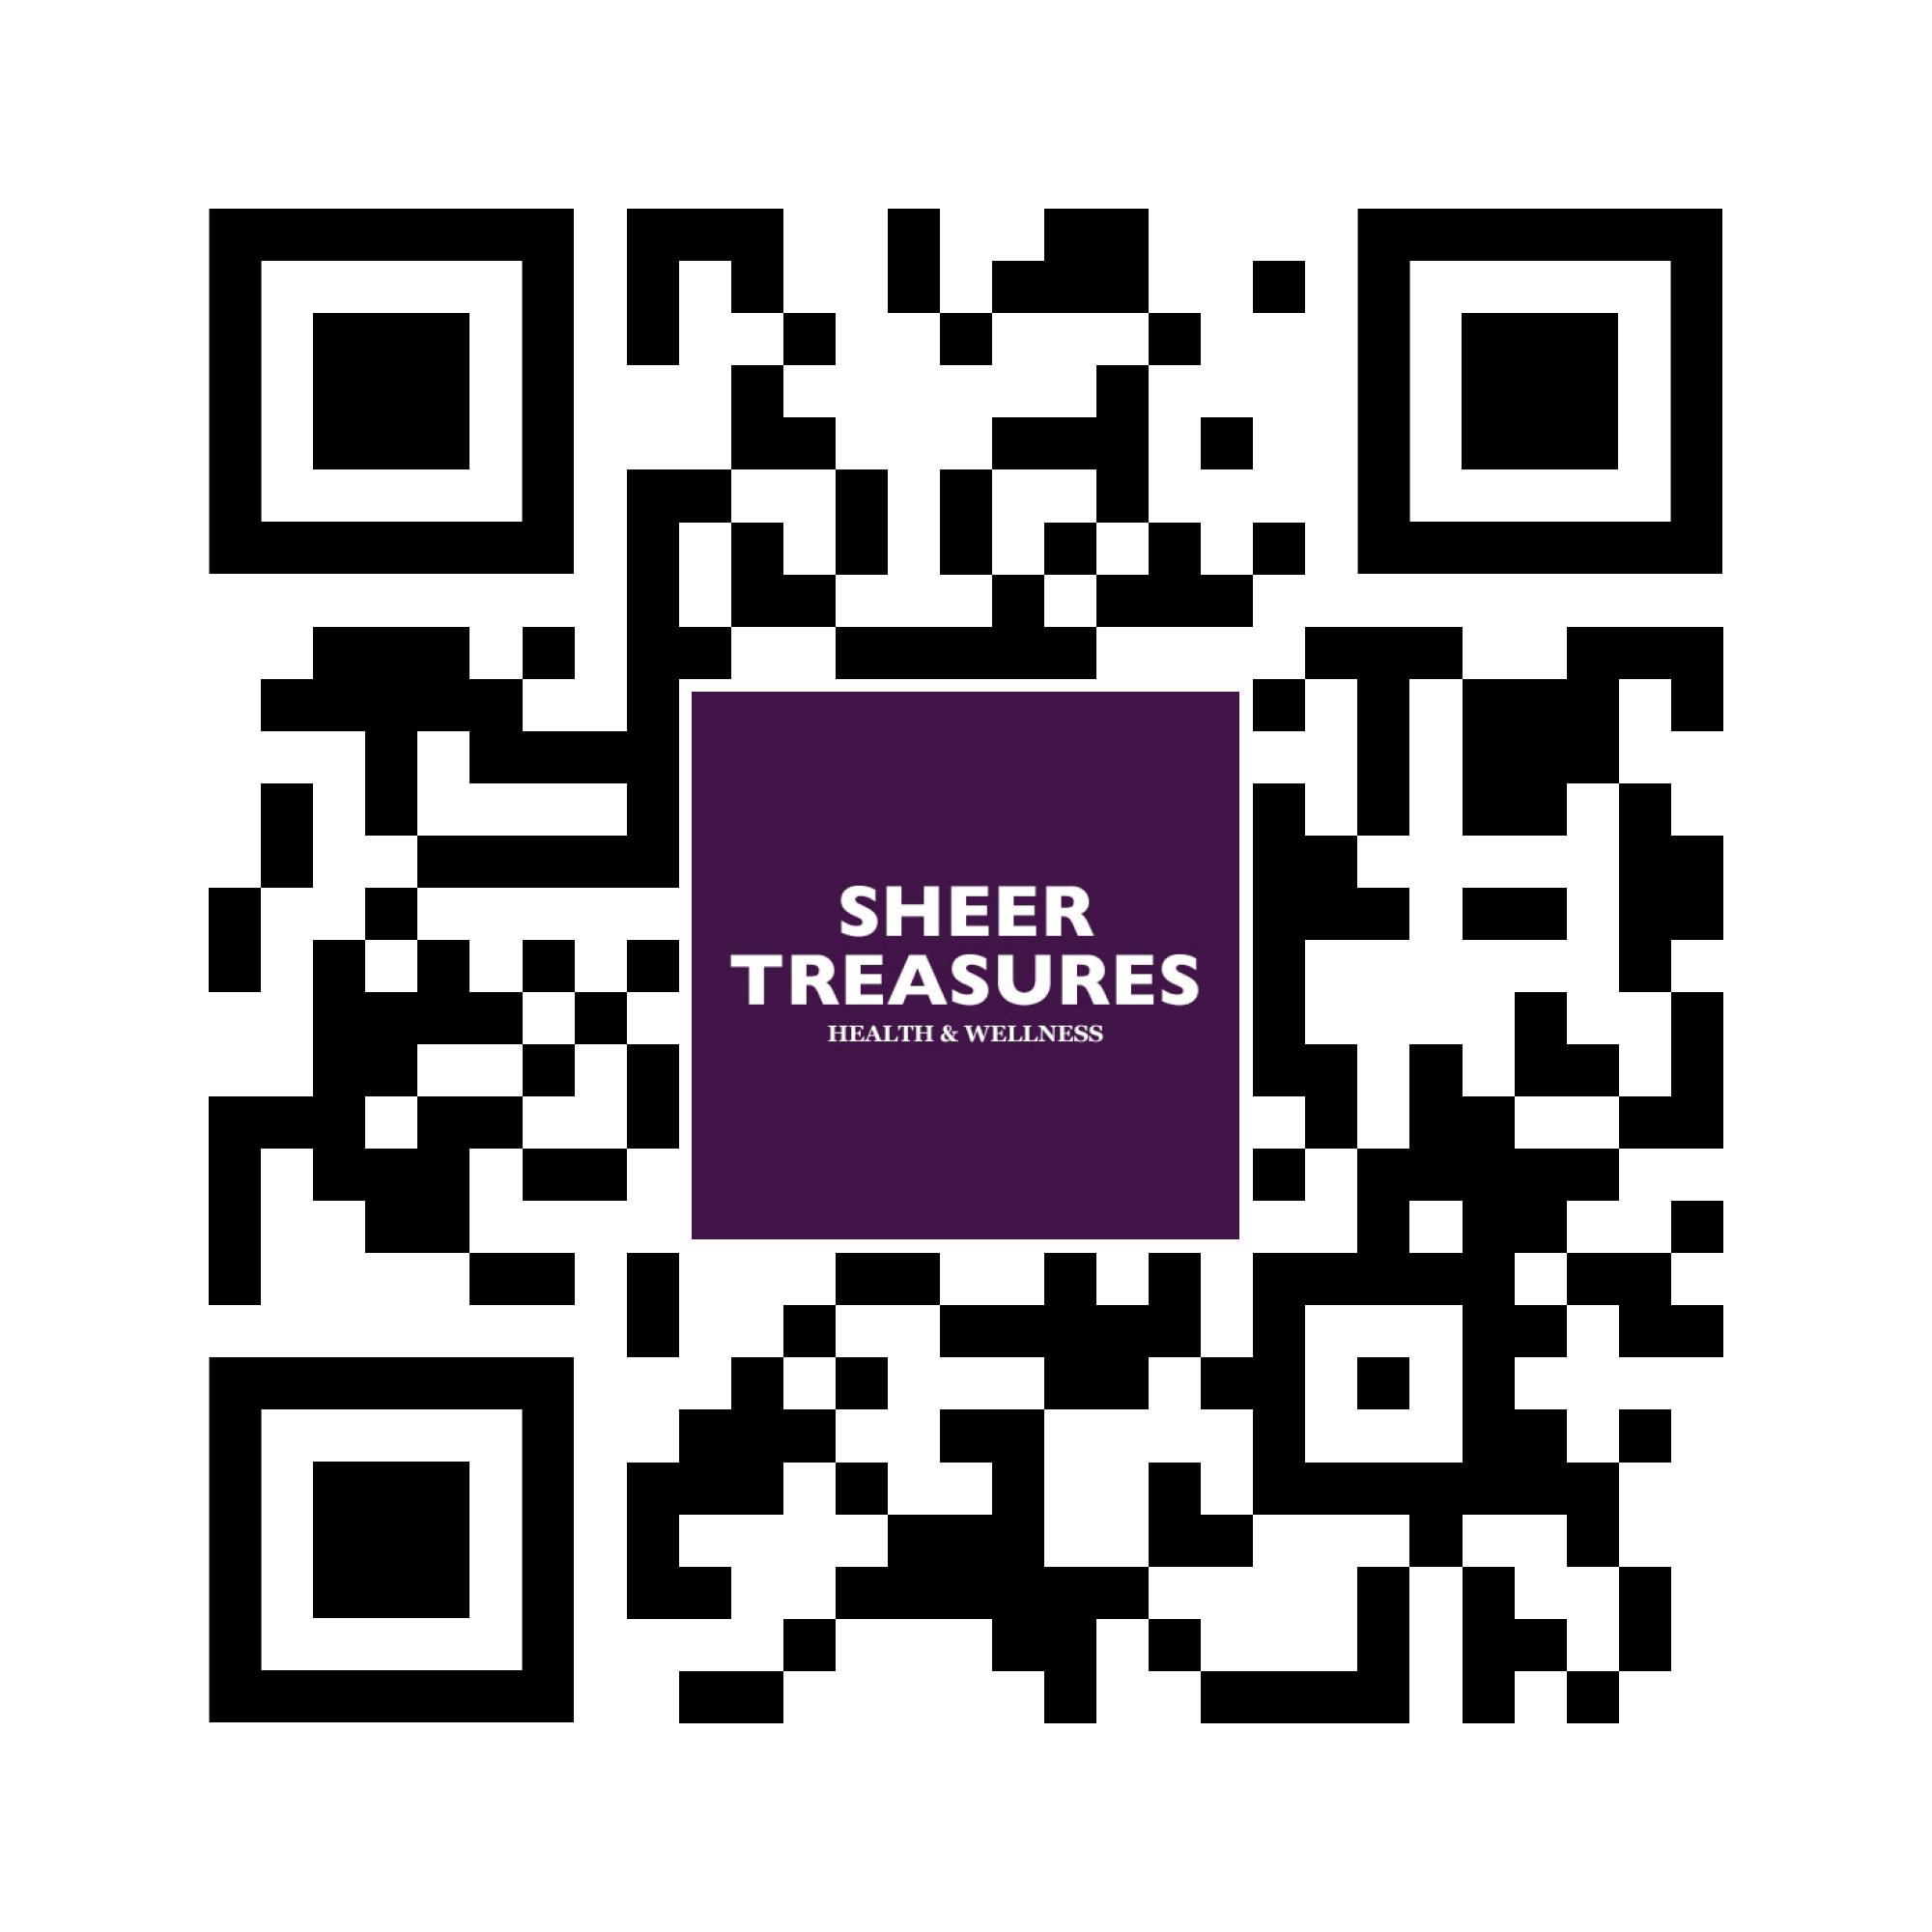 Sheer Treasures Co. - Ridgedale Center, Minnetonka, MN. 55305 image 1